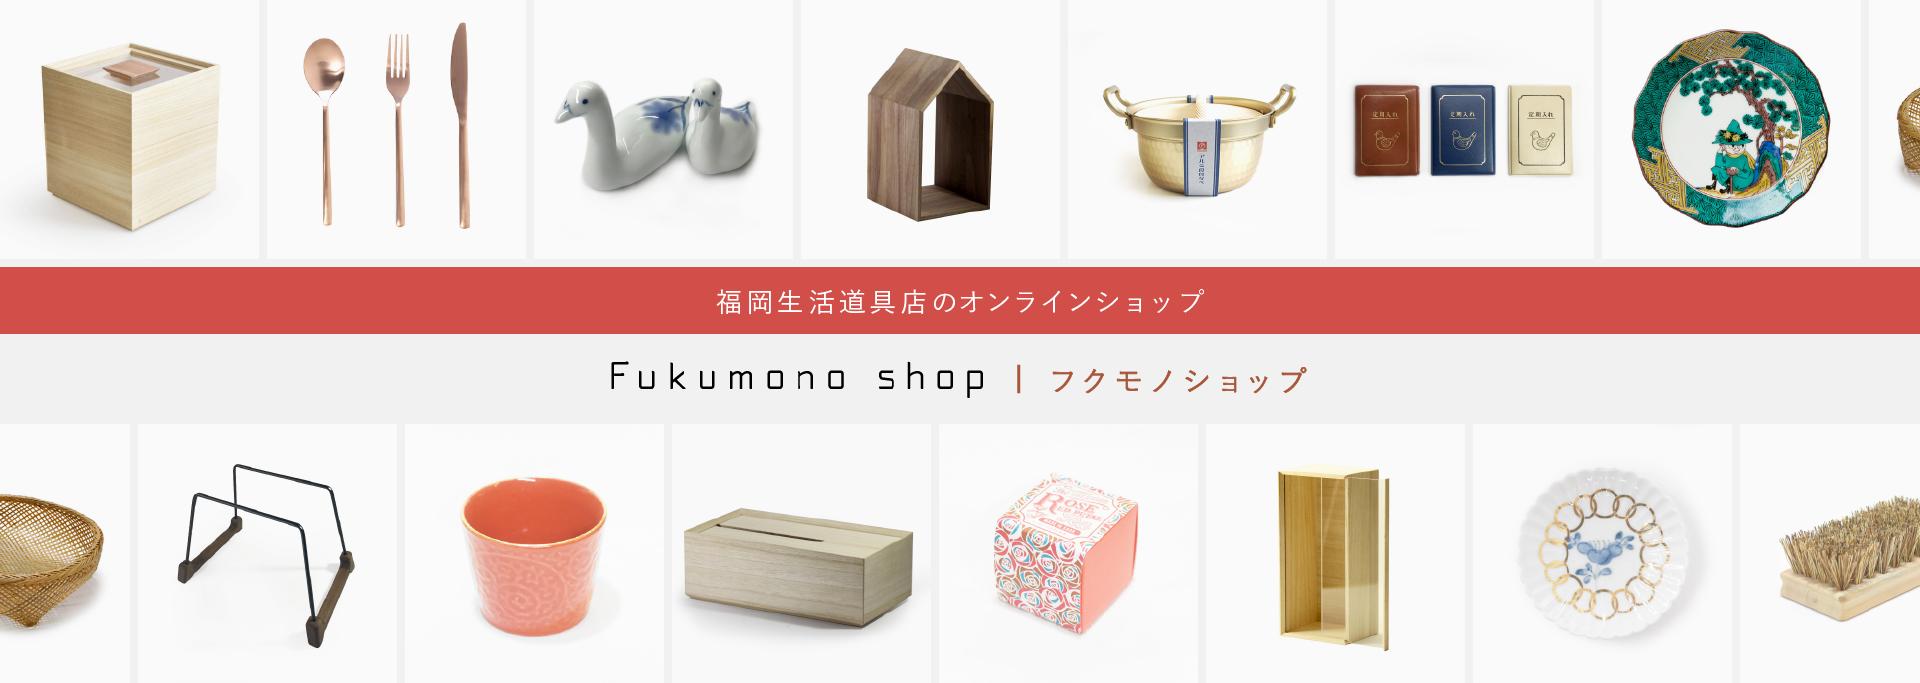 Fukumono shop | フクモノショップ